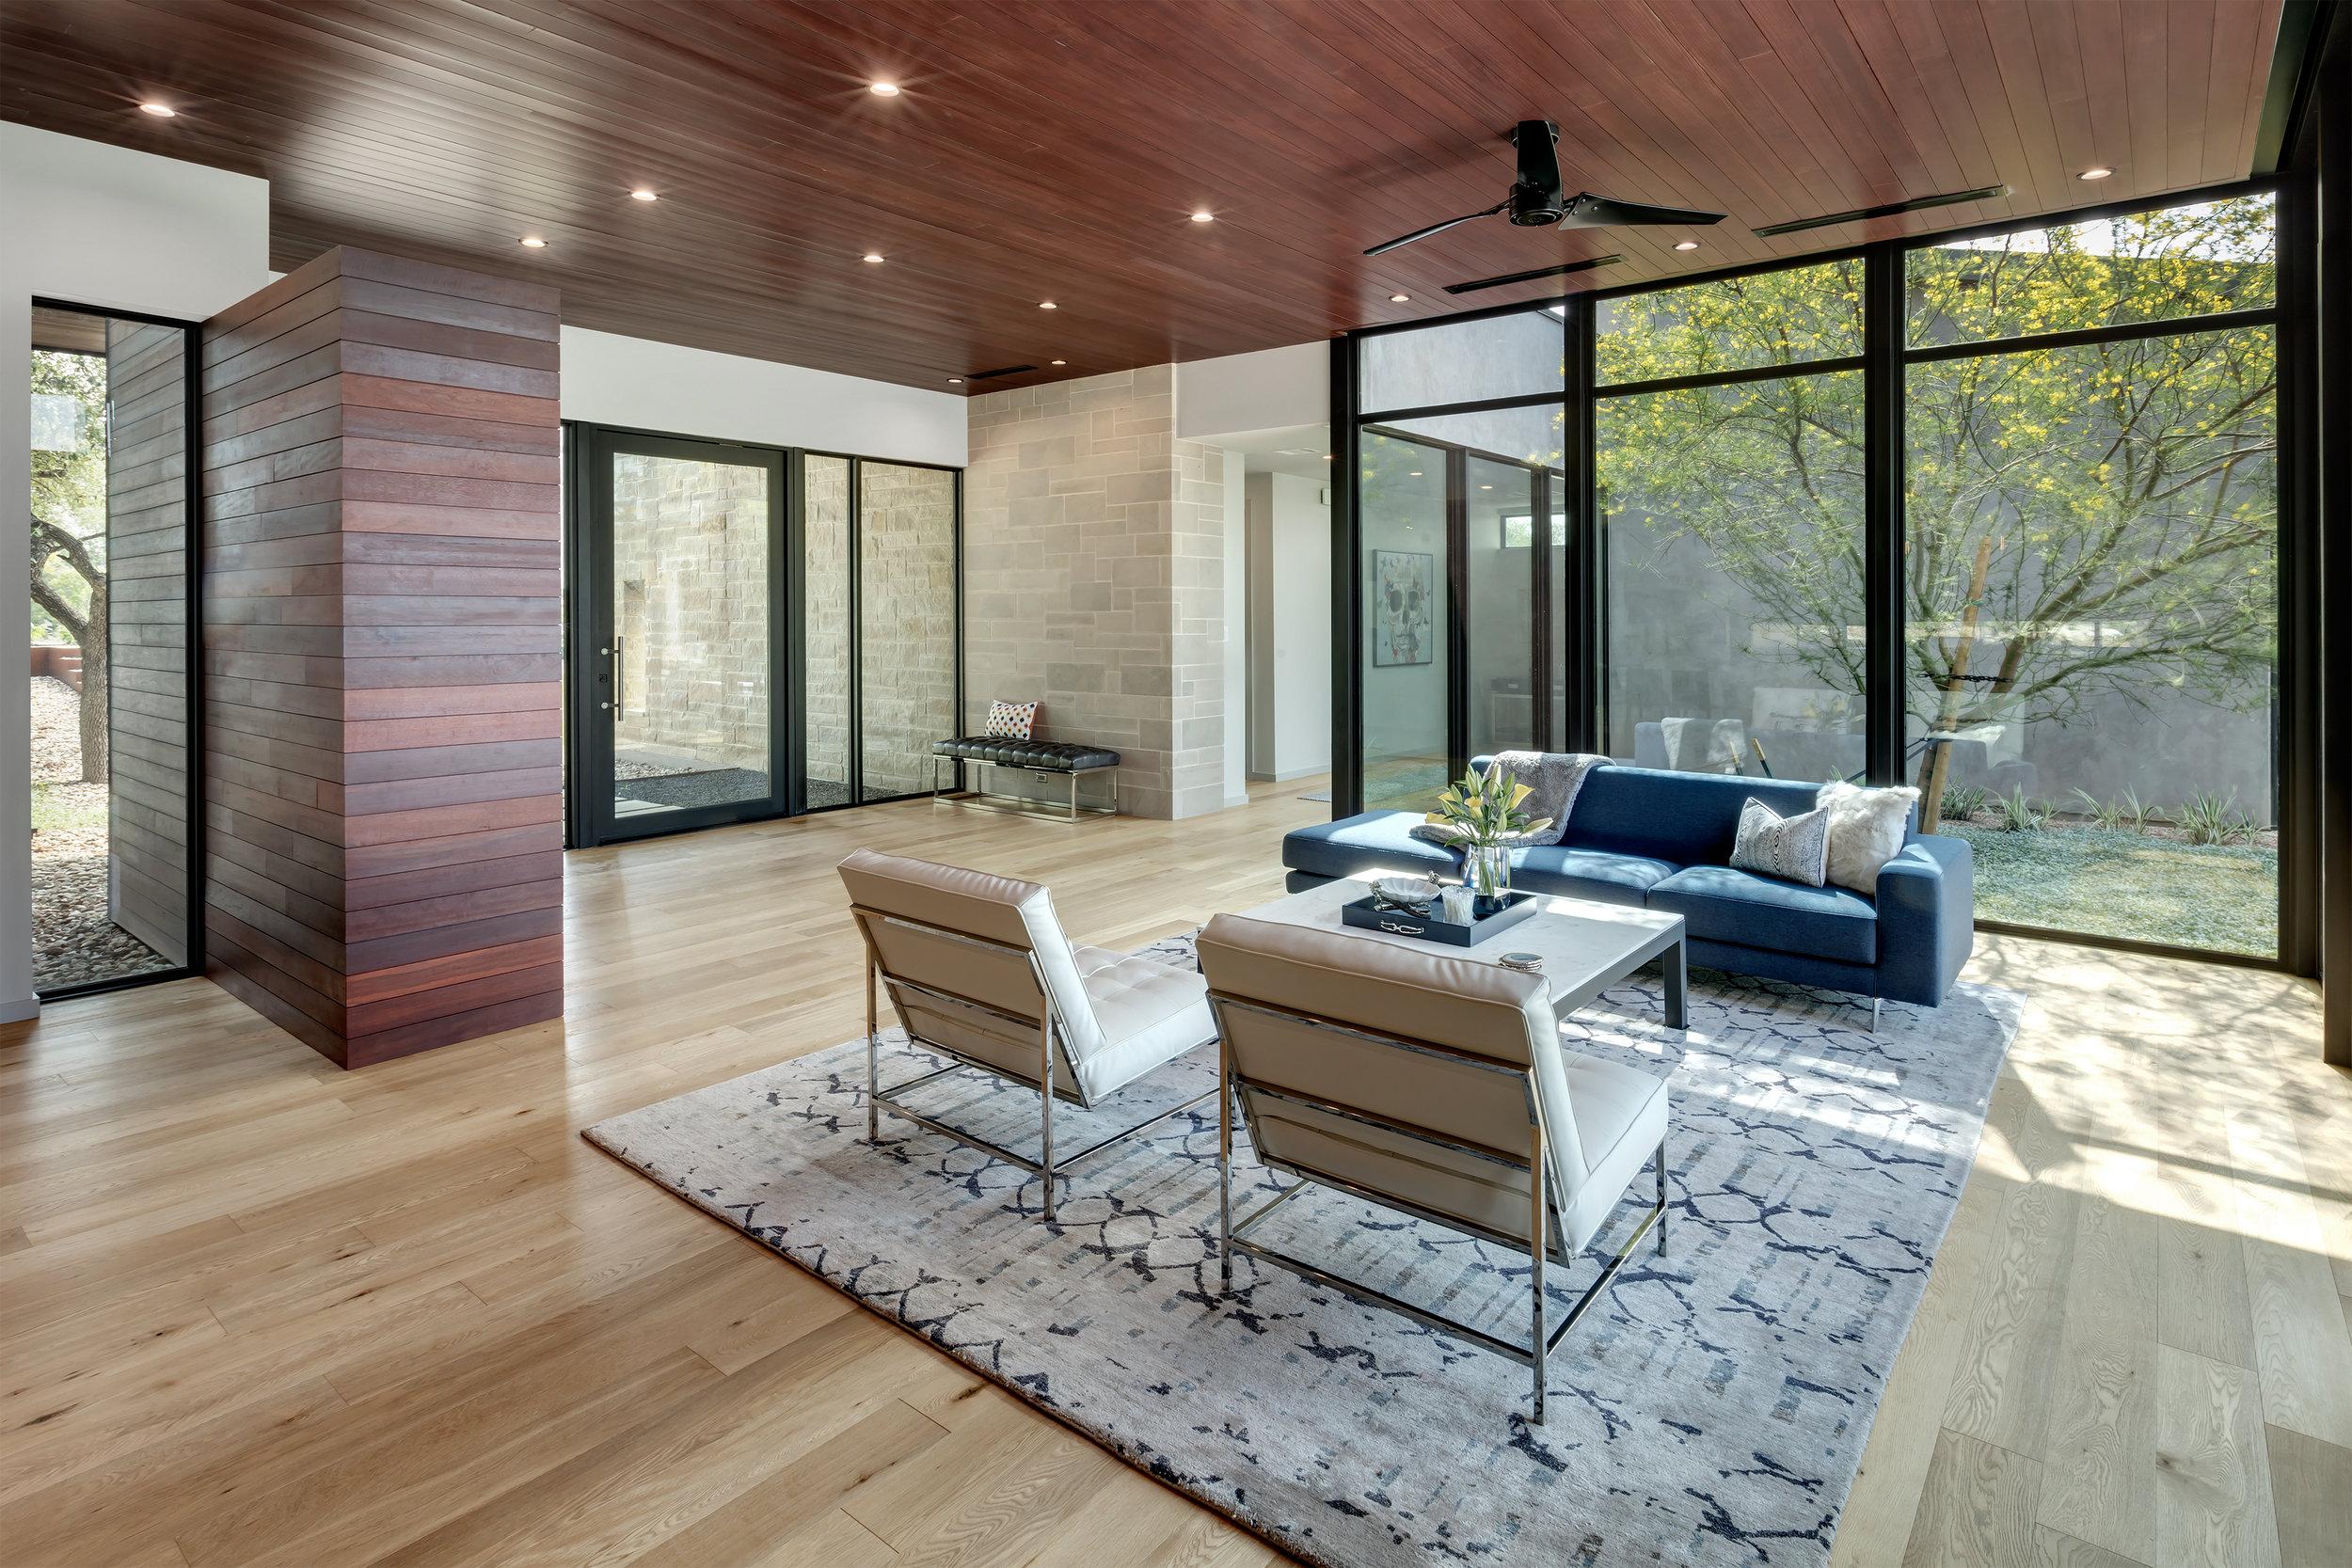 Matt Fajkus MF Architecture_Control-Shift House_Interior Photo 3 by Charles Davis Smith.jpg